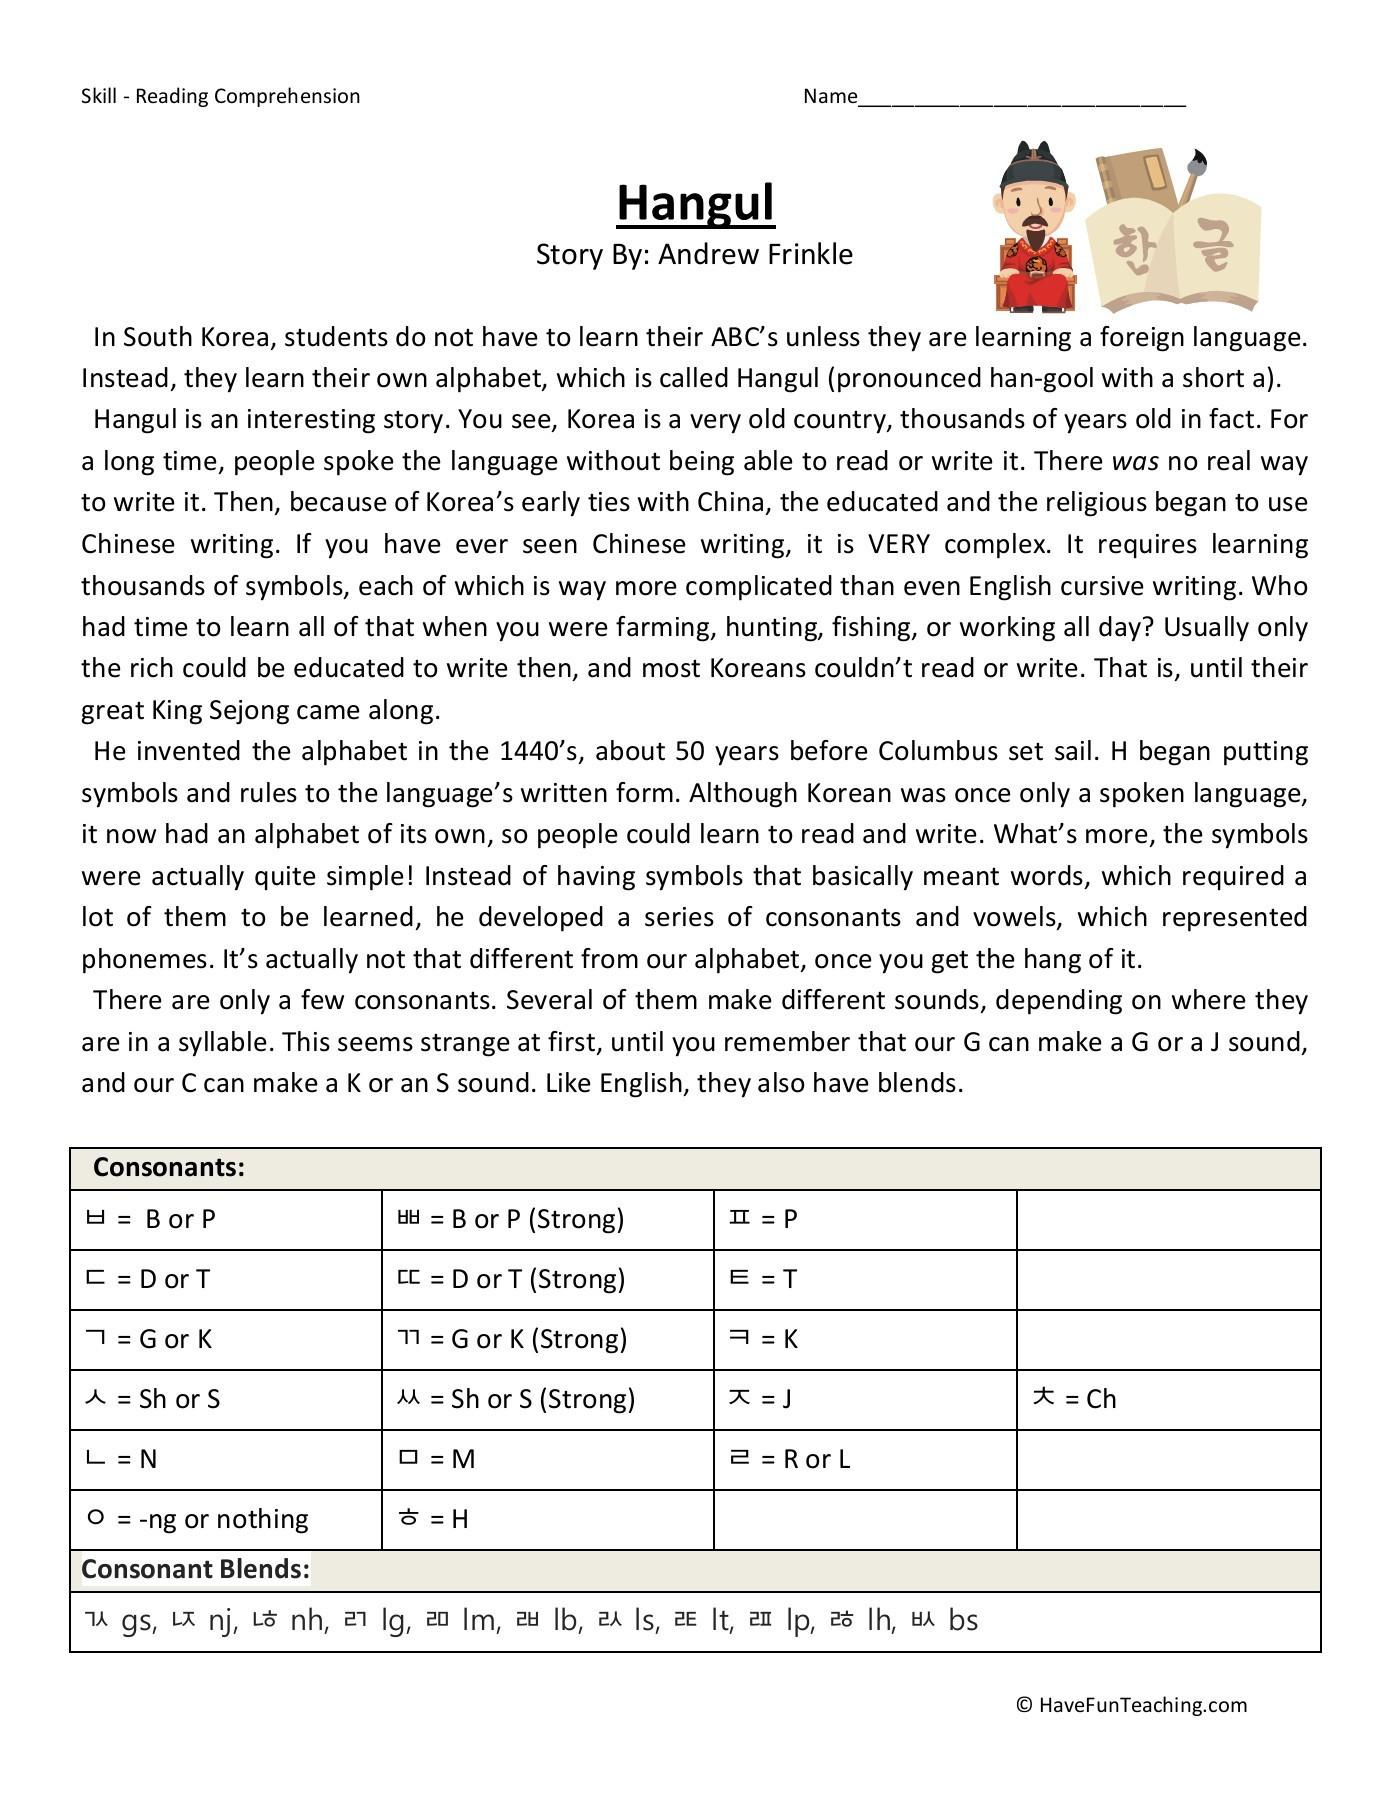 6th Grade Reading Worksheets Hangul Sixth Grade Reading Prehension Worksheet Pages 1